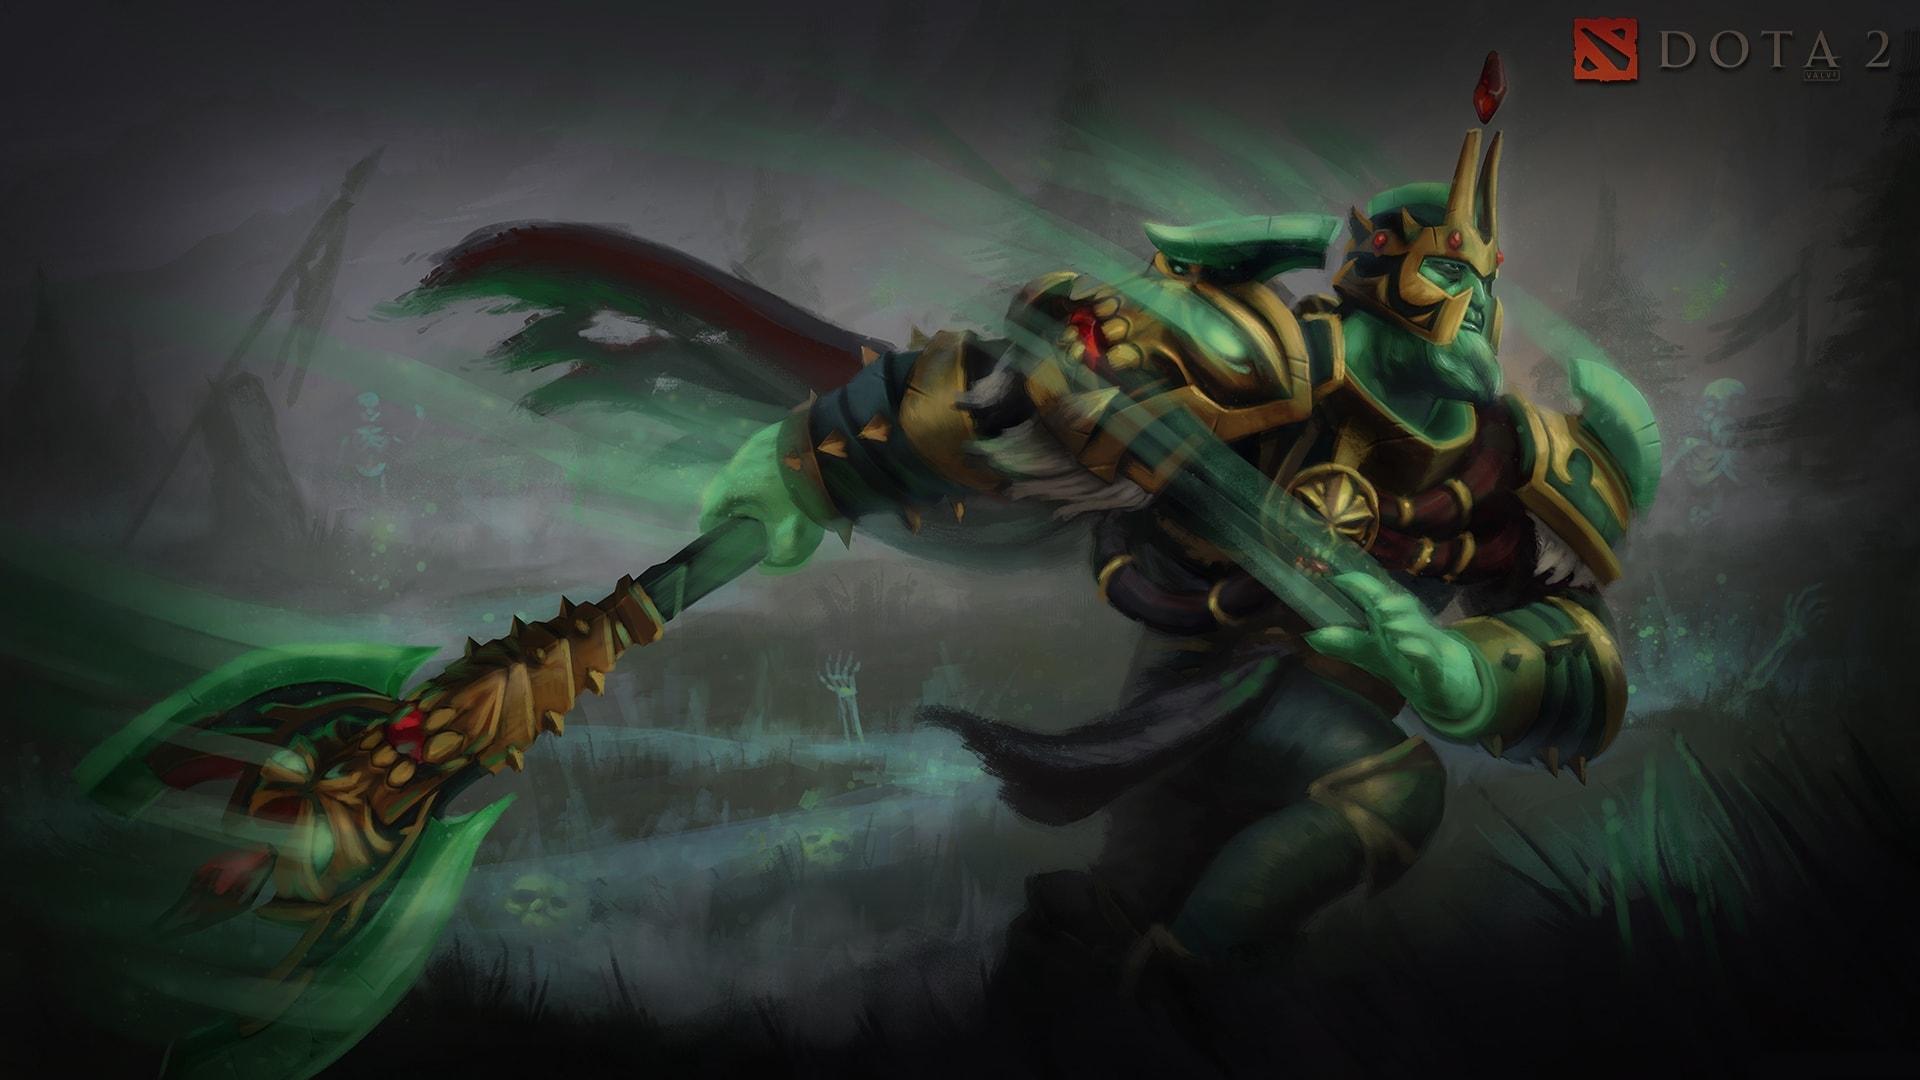 Dota2 : Wraith King HD